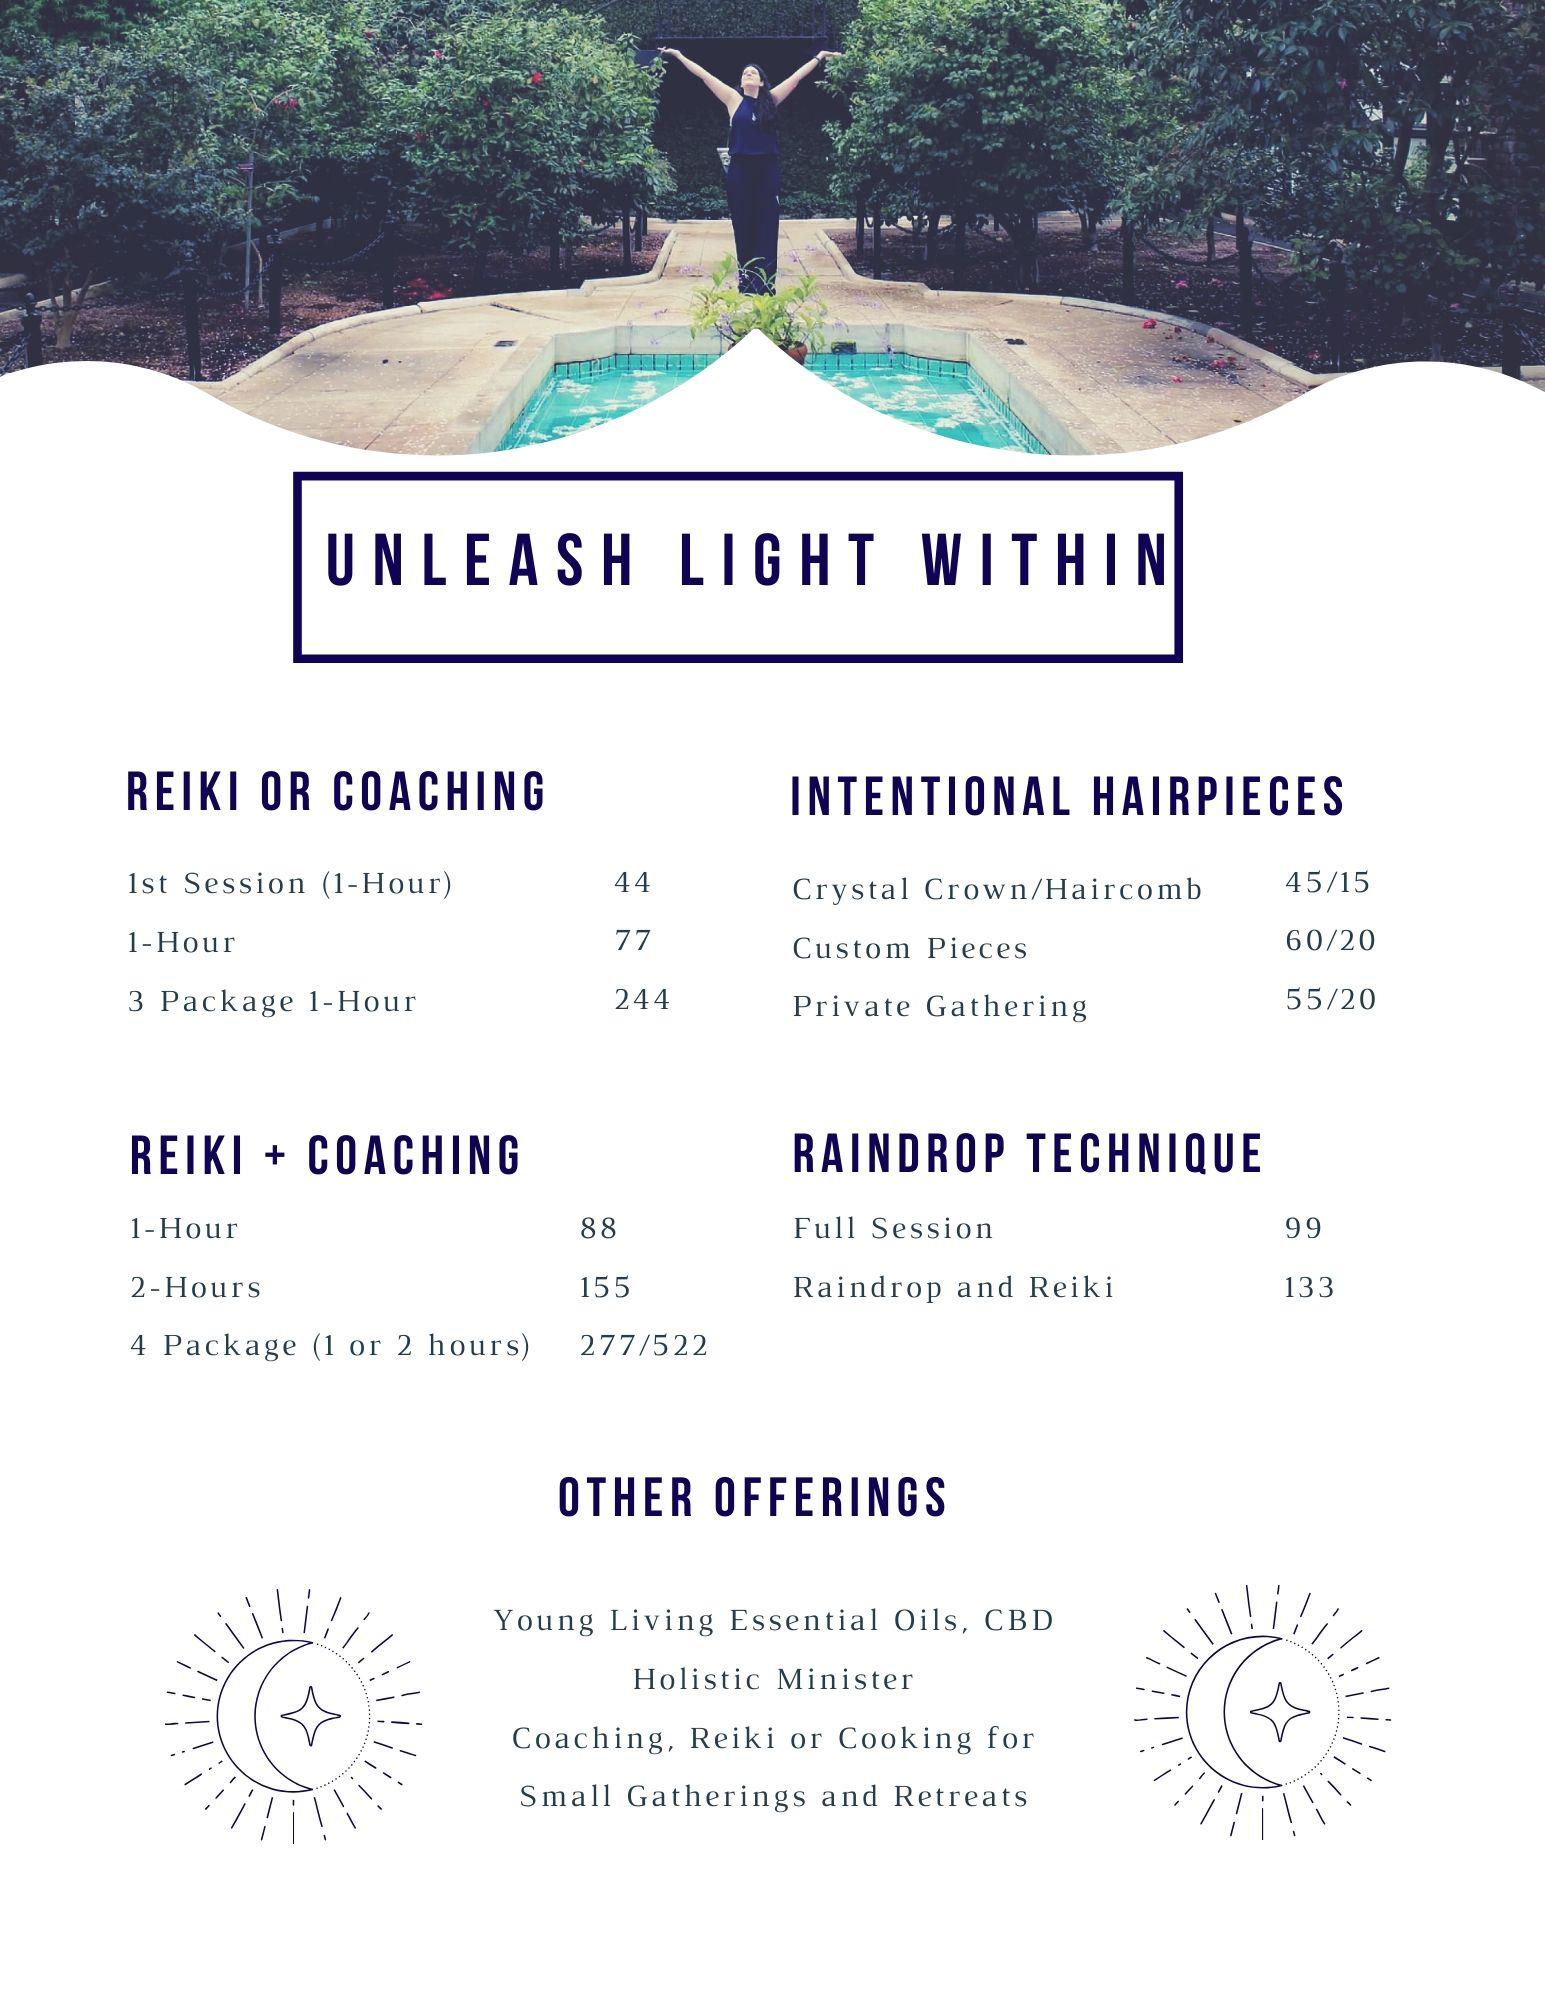 UNLEASH LIGHT WITHIN